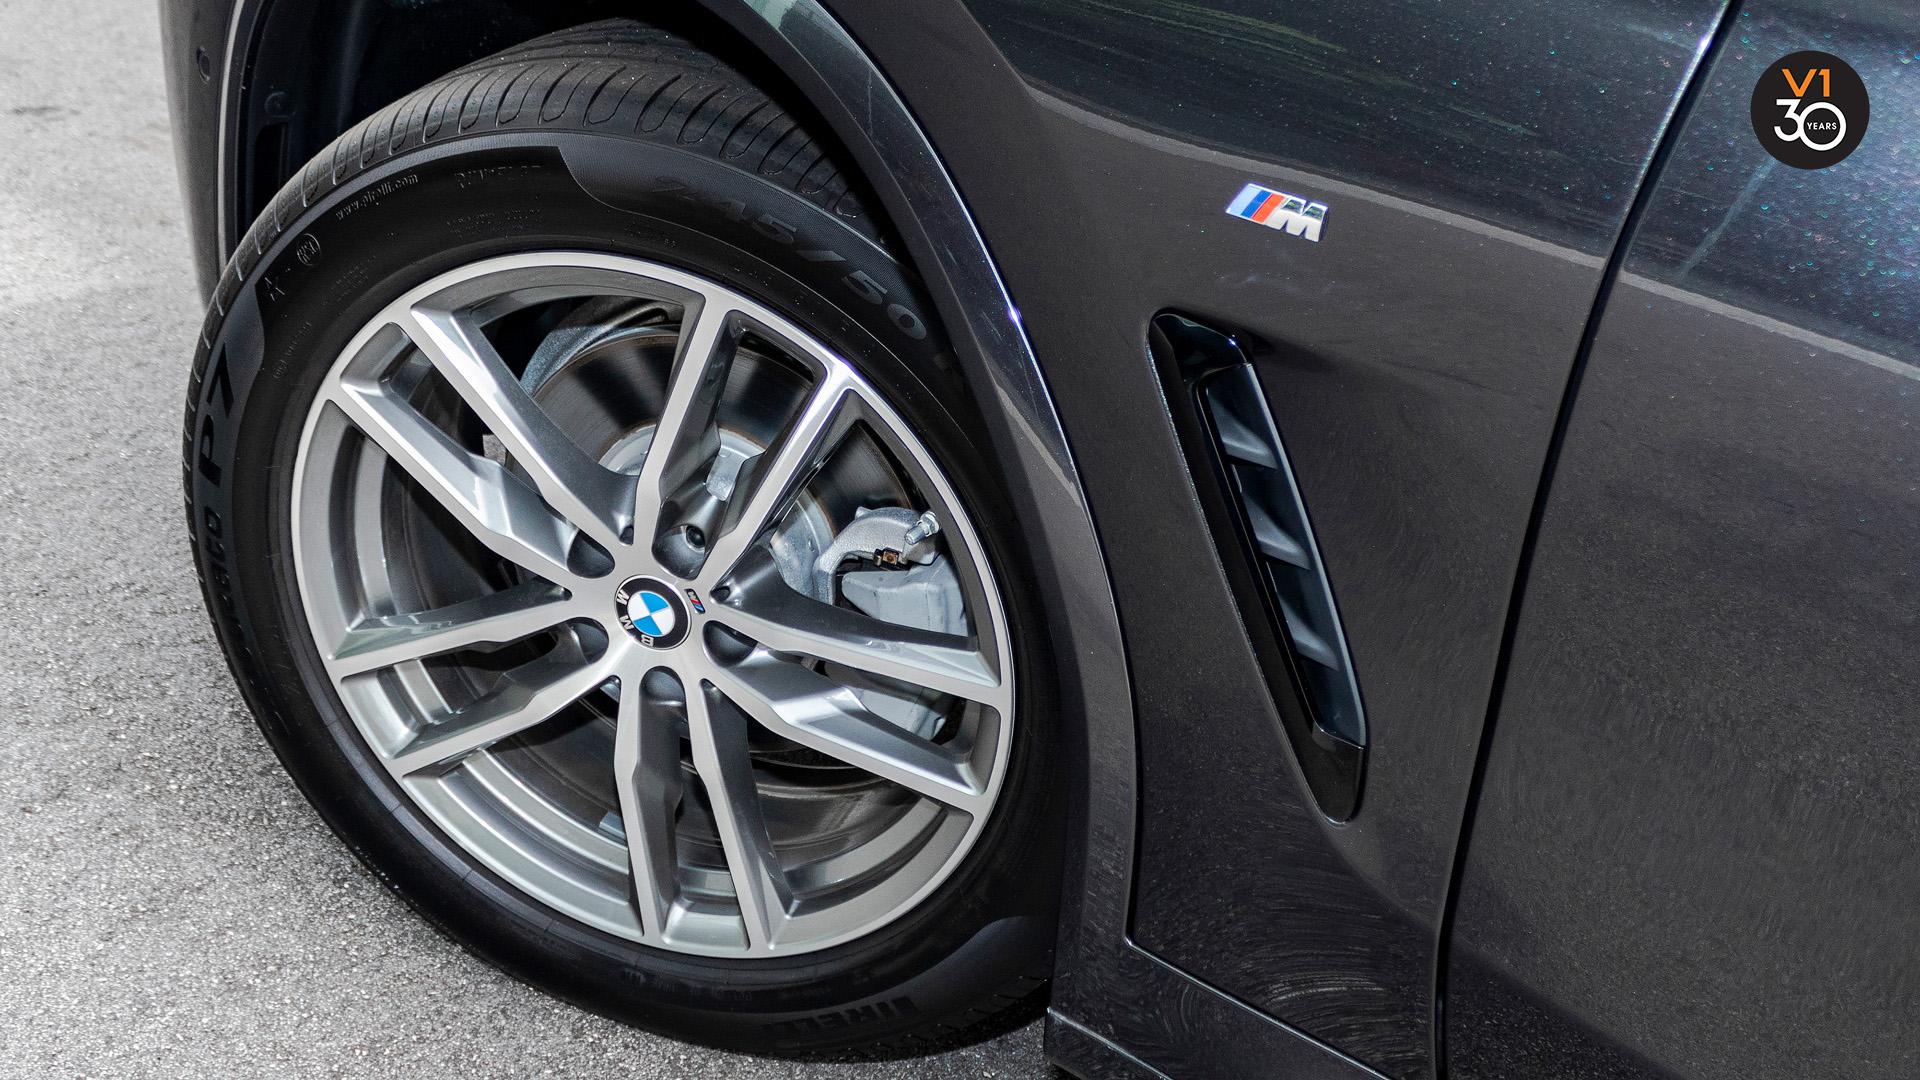 BMW X3 XDrive 2.0I M Sport - Wheels